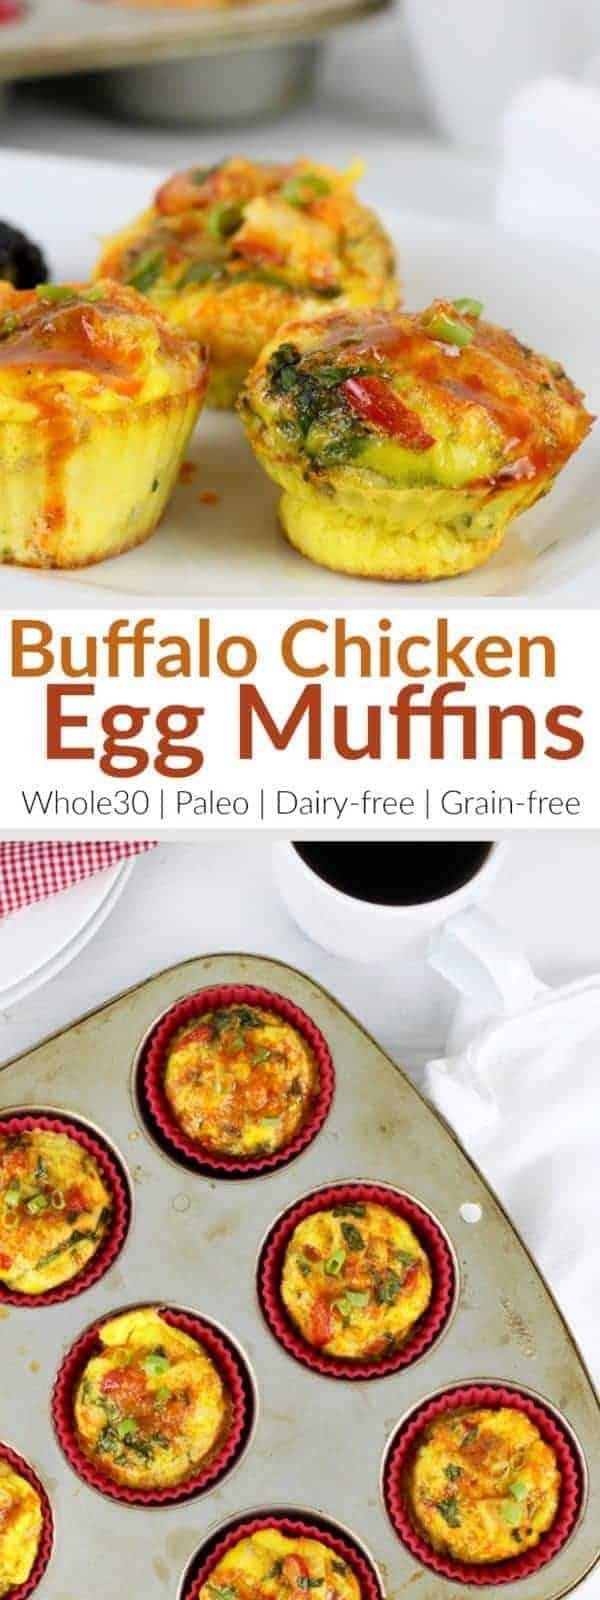 Buffalo Chicken Egg Muffins